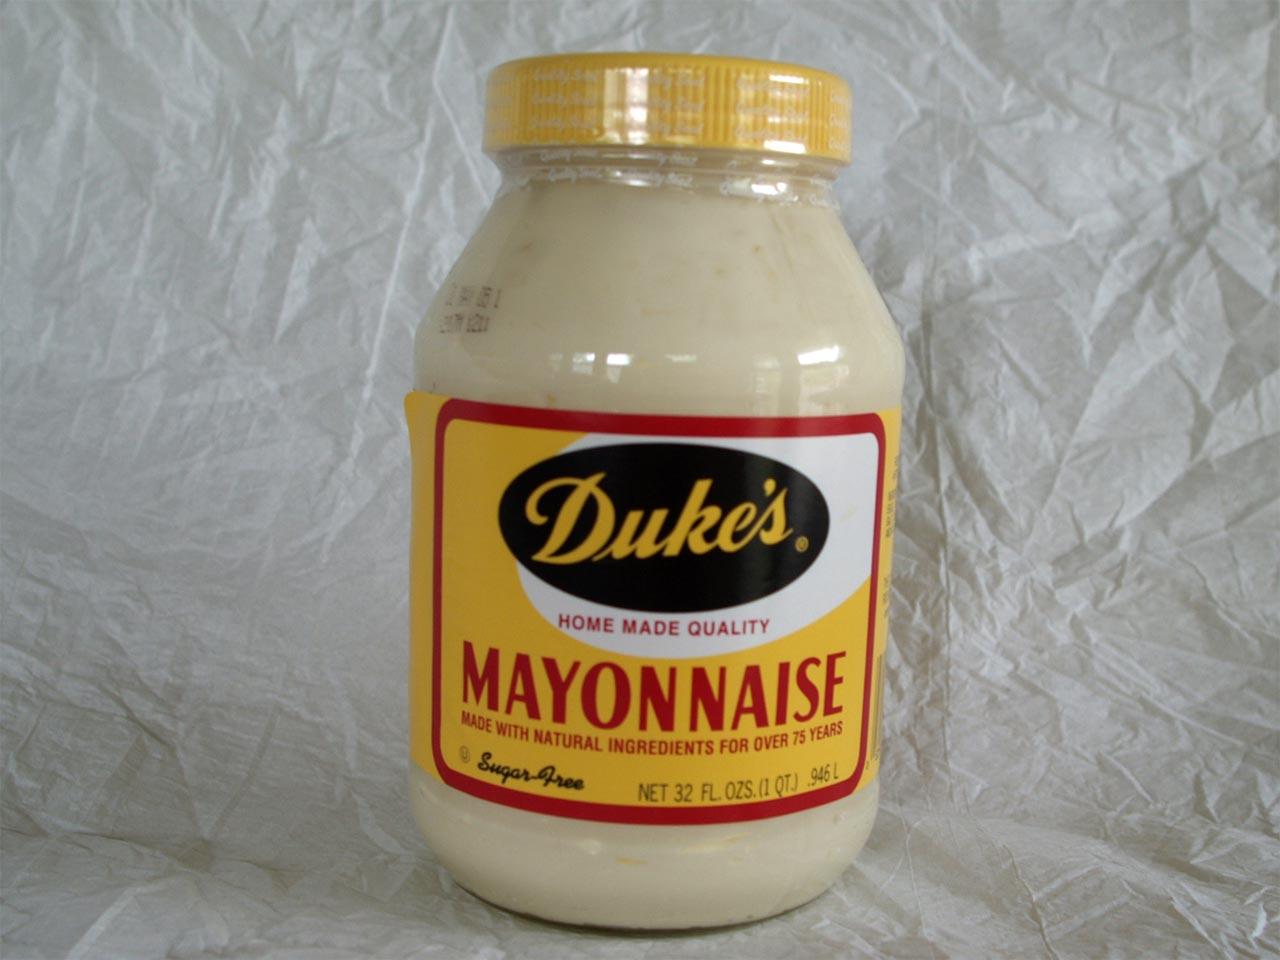 File:Duke's Mayonnaise.jpg - Wikimedia Commons